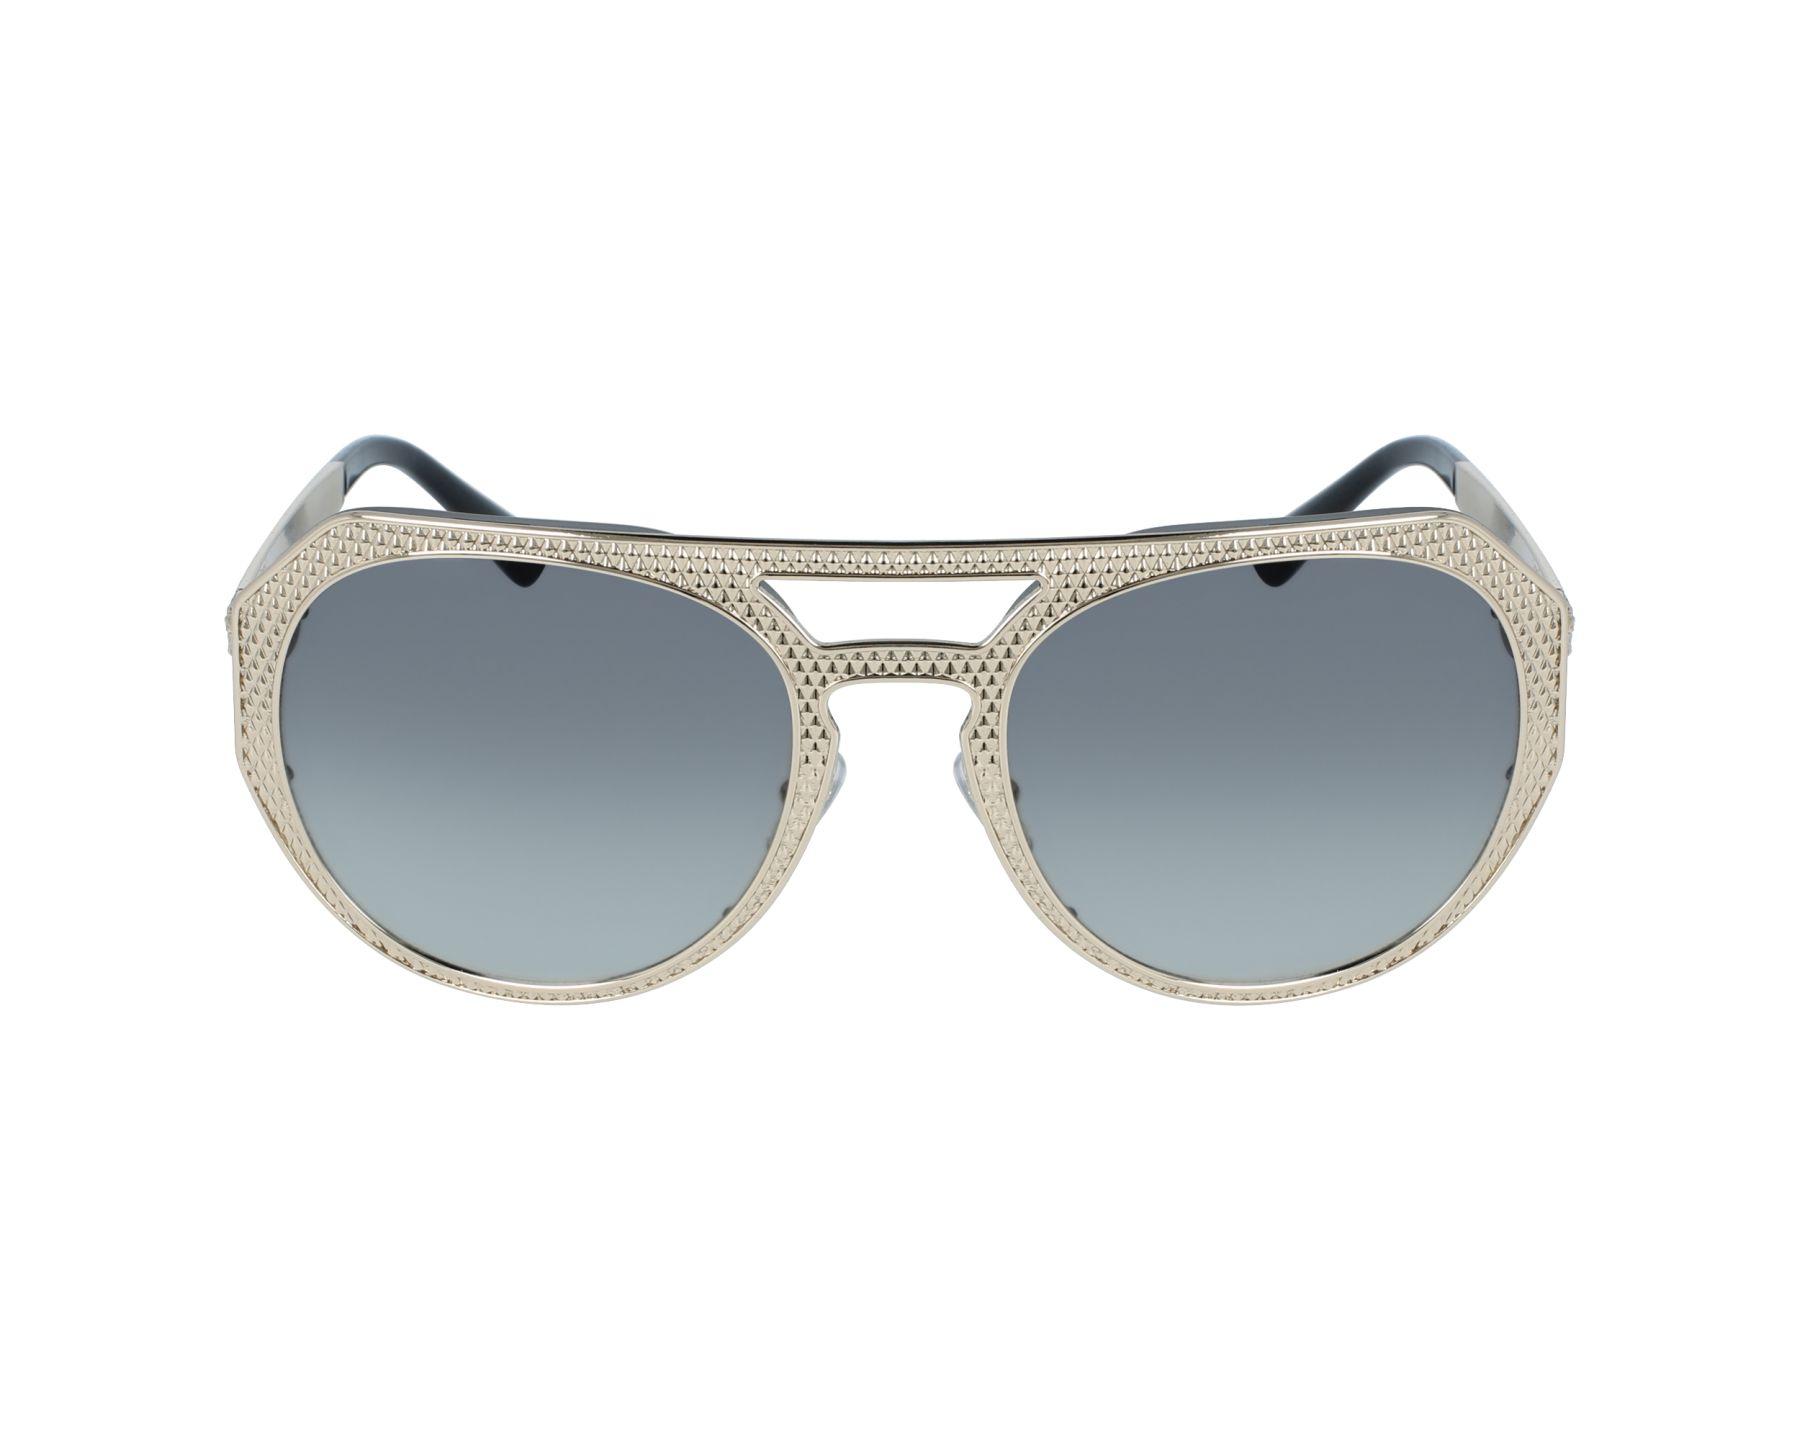 lunettes de soleil versace ve 2175 1252 11 or avec des verres gris. Black Bedroom Furniture Sets. Home Design Ideas